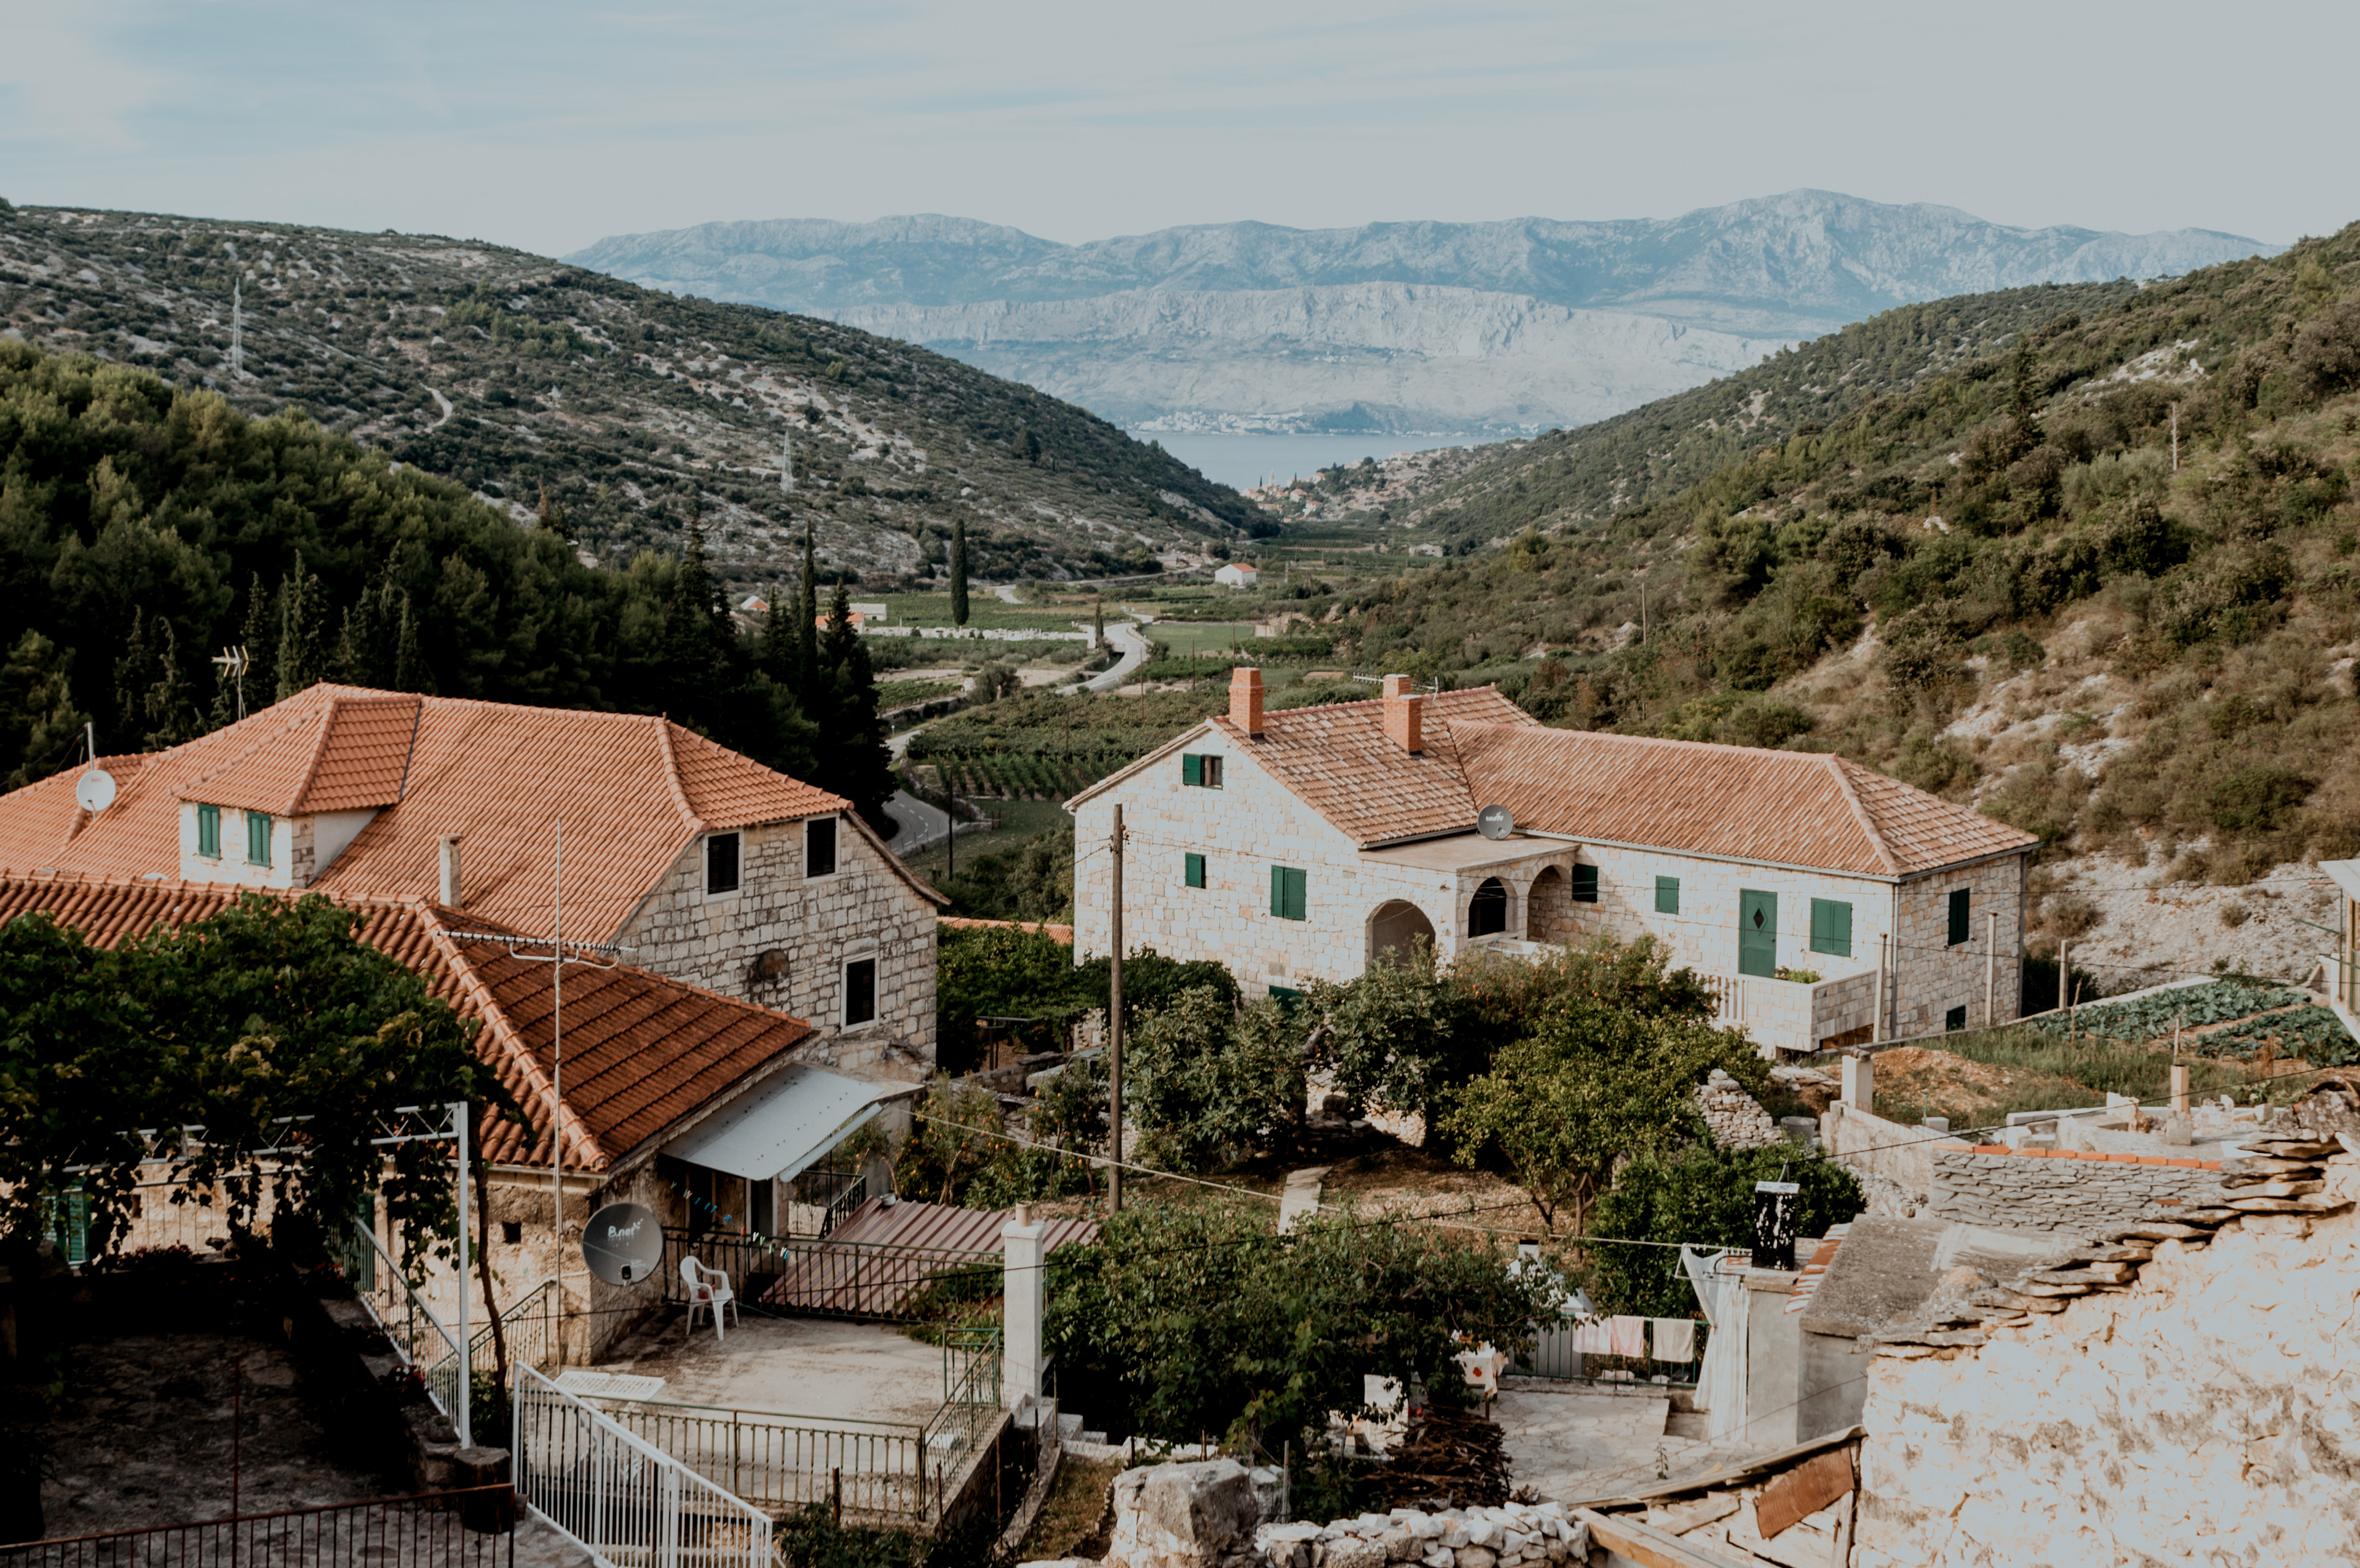 Chorwacja, wyspa Brač, dzień 2- Splitska, Postira, Dol, Škrip